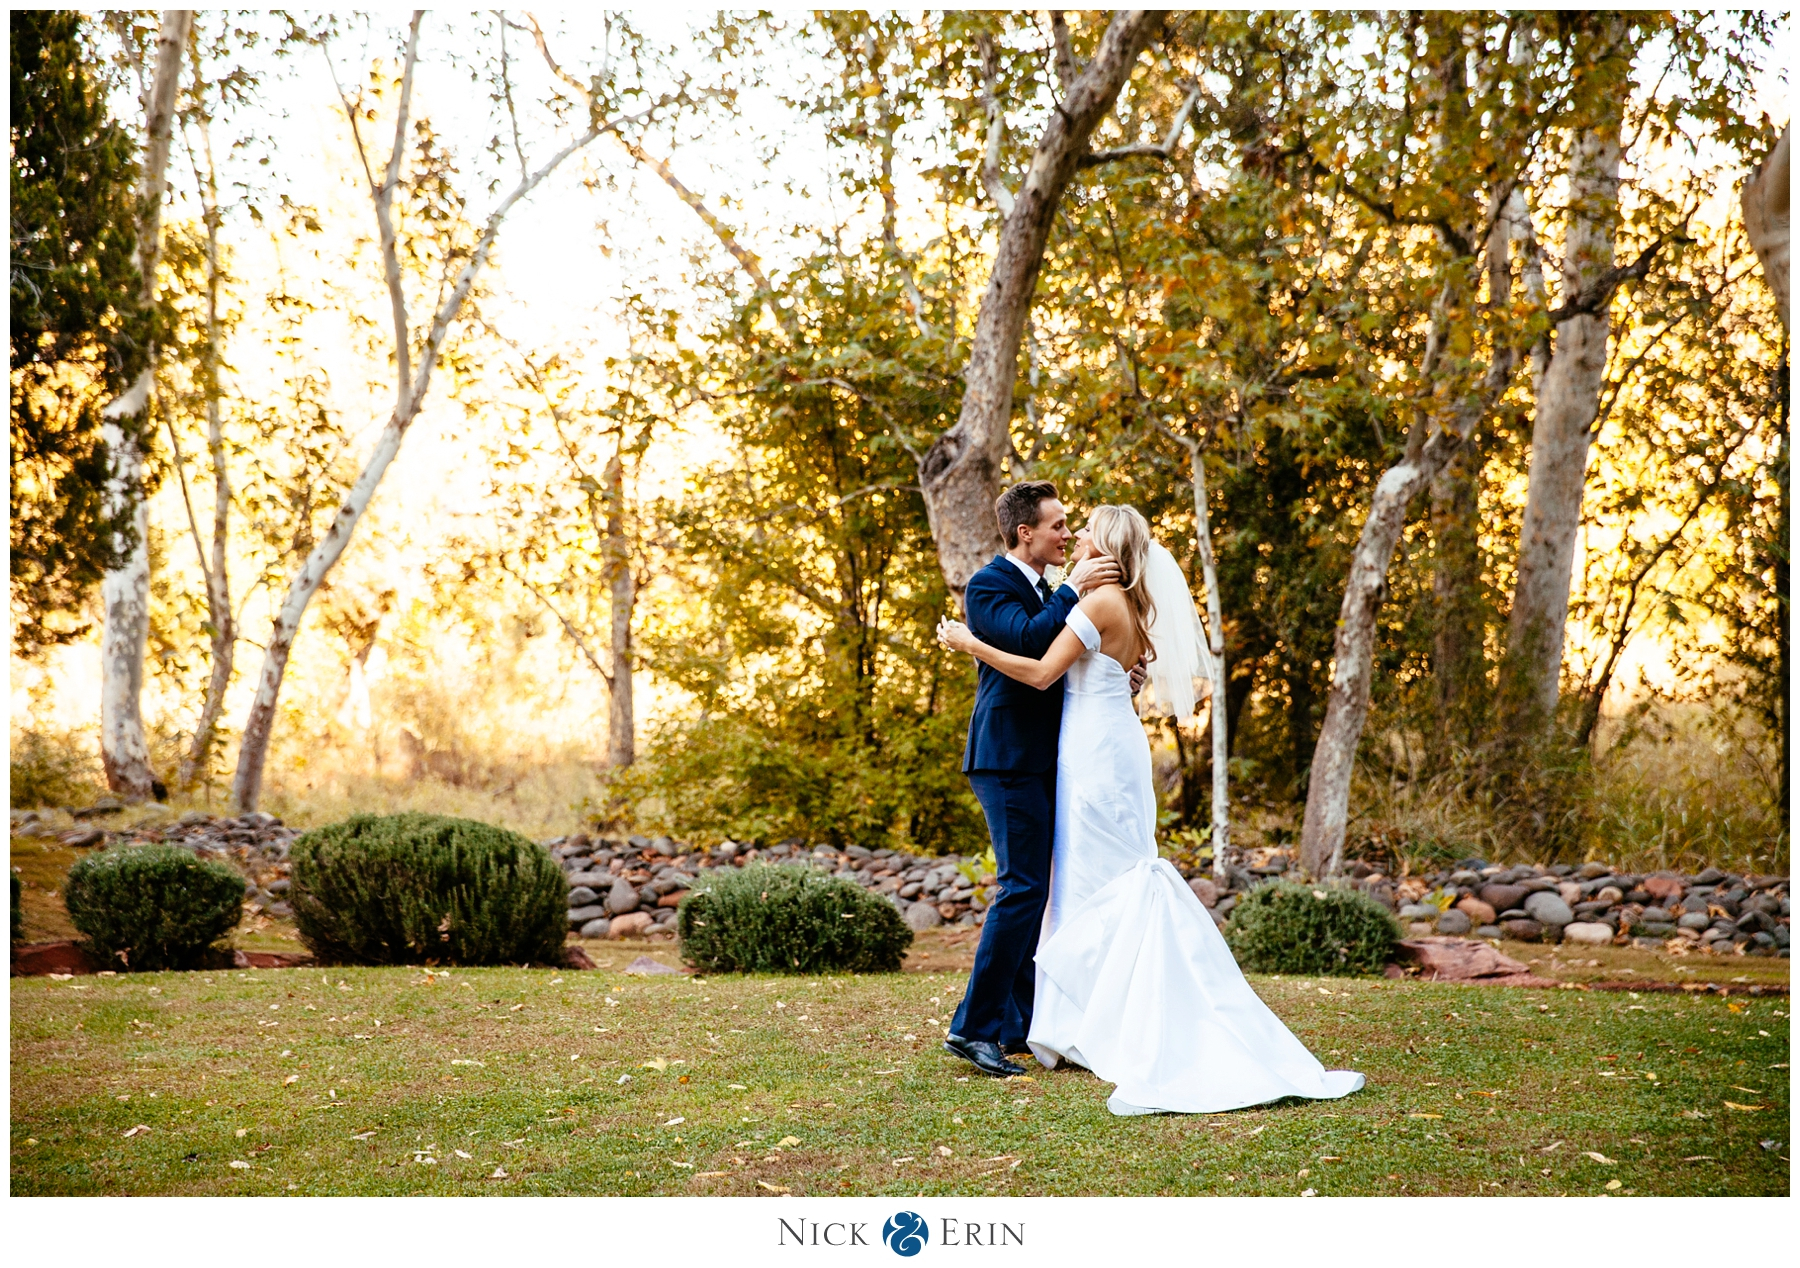 Donner_Photography_Sedona Arizona Wedding_Alissa and Tom_0049